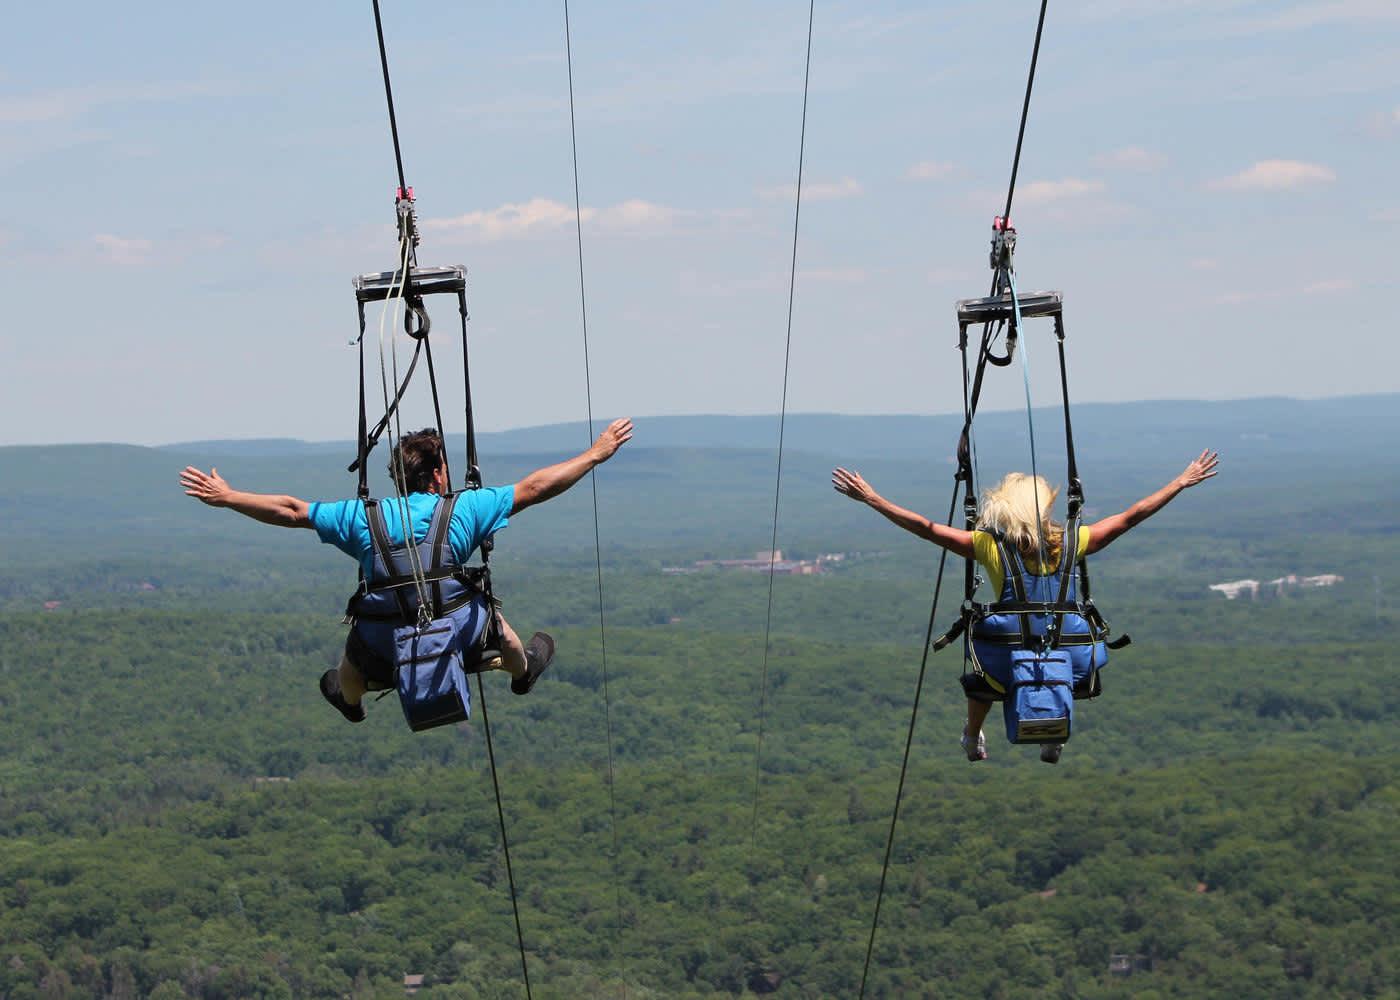 Poconos Zipline | Fly Through the Forest in the Pocono Mountains